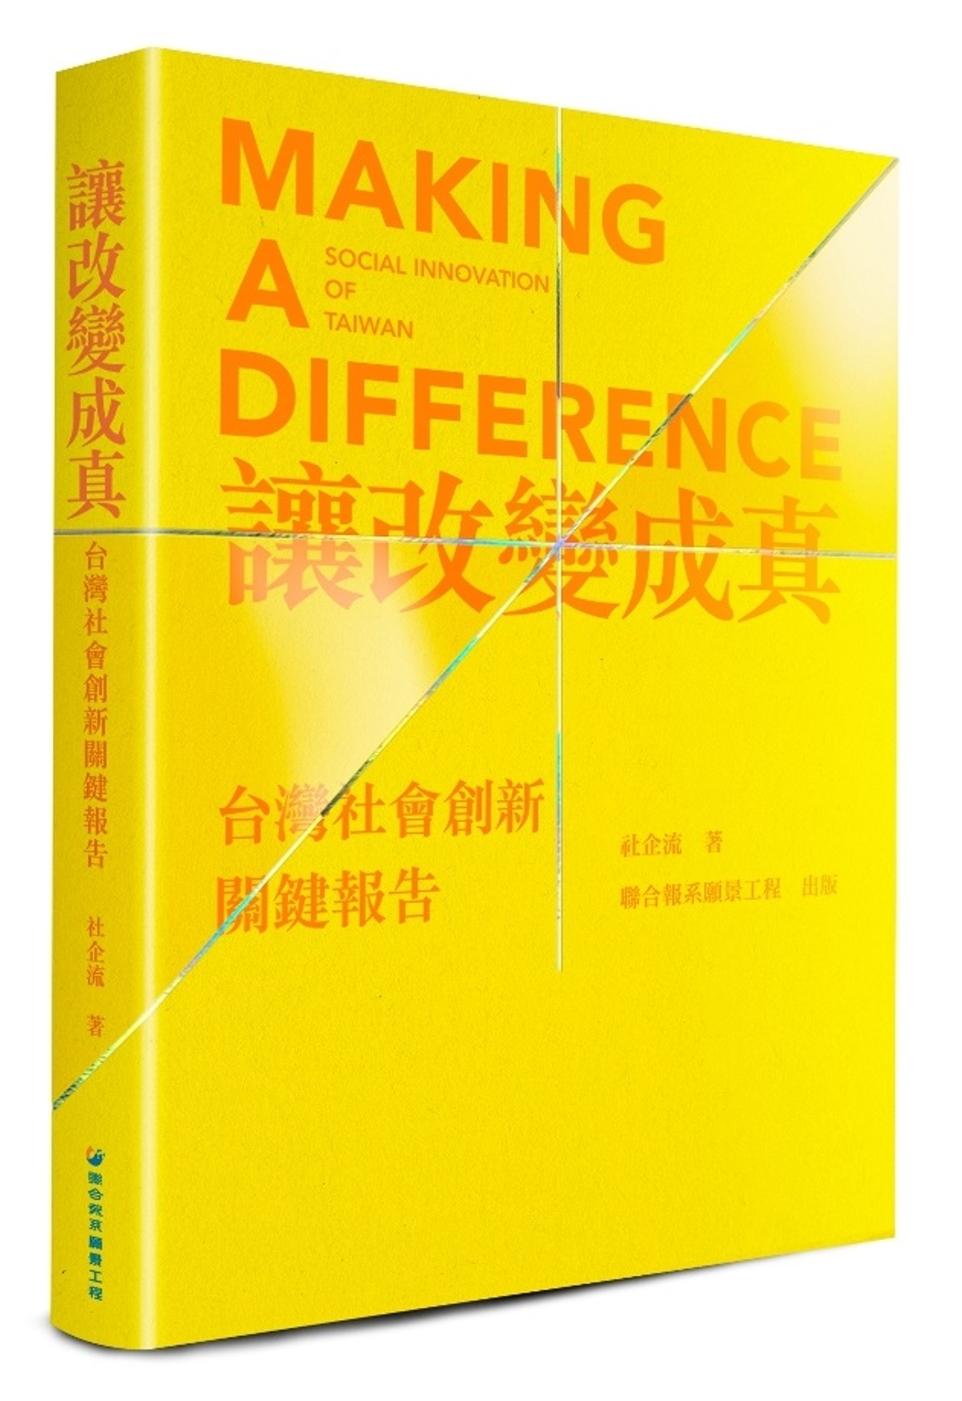 ►GO►最新優惠► [暢銷書]讓改變成真:台灣社會創新關鍵報告